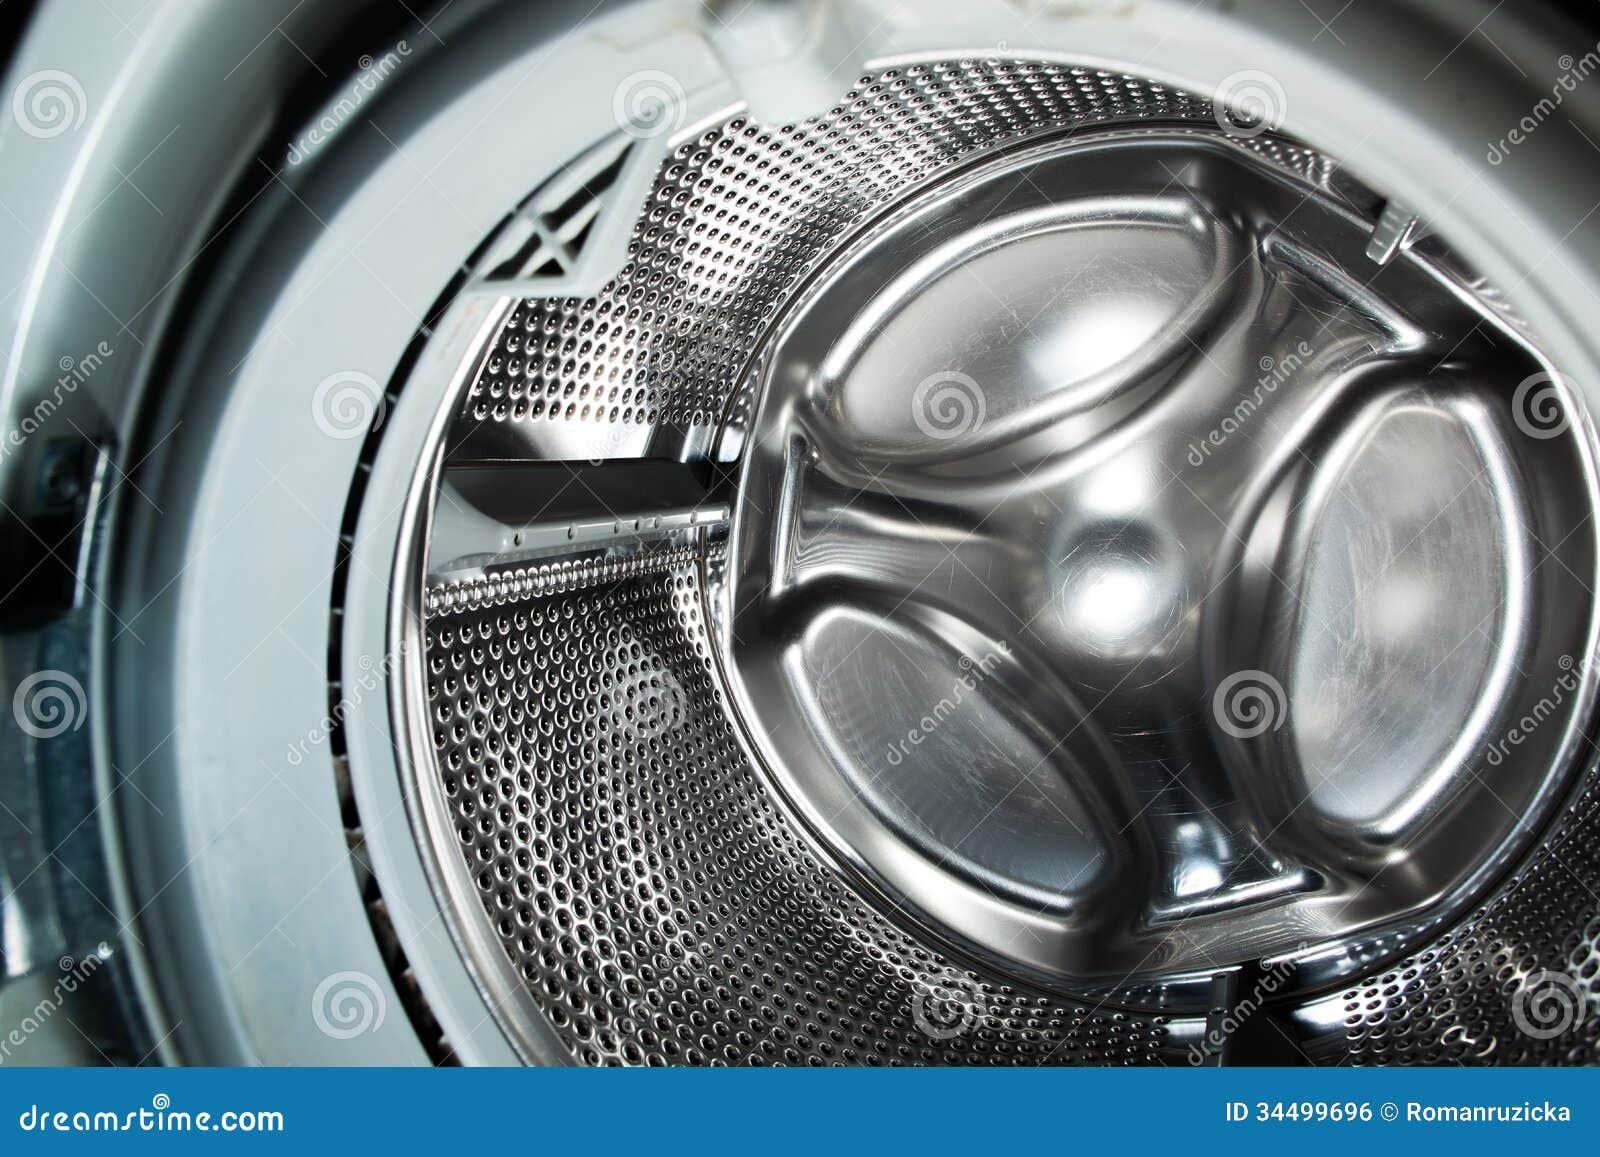 inside a washing machine